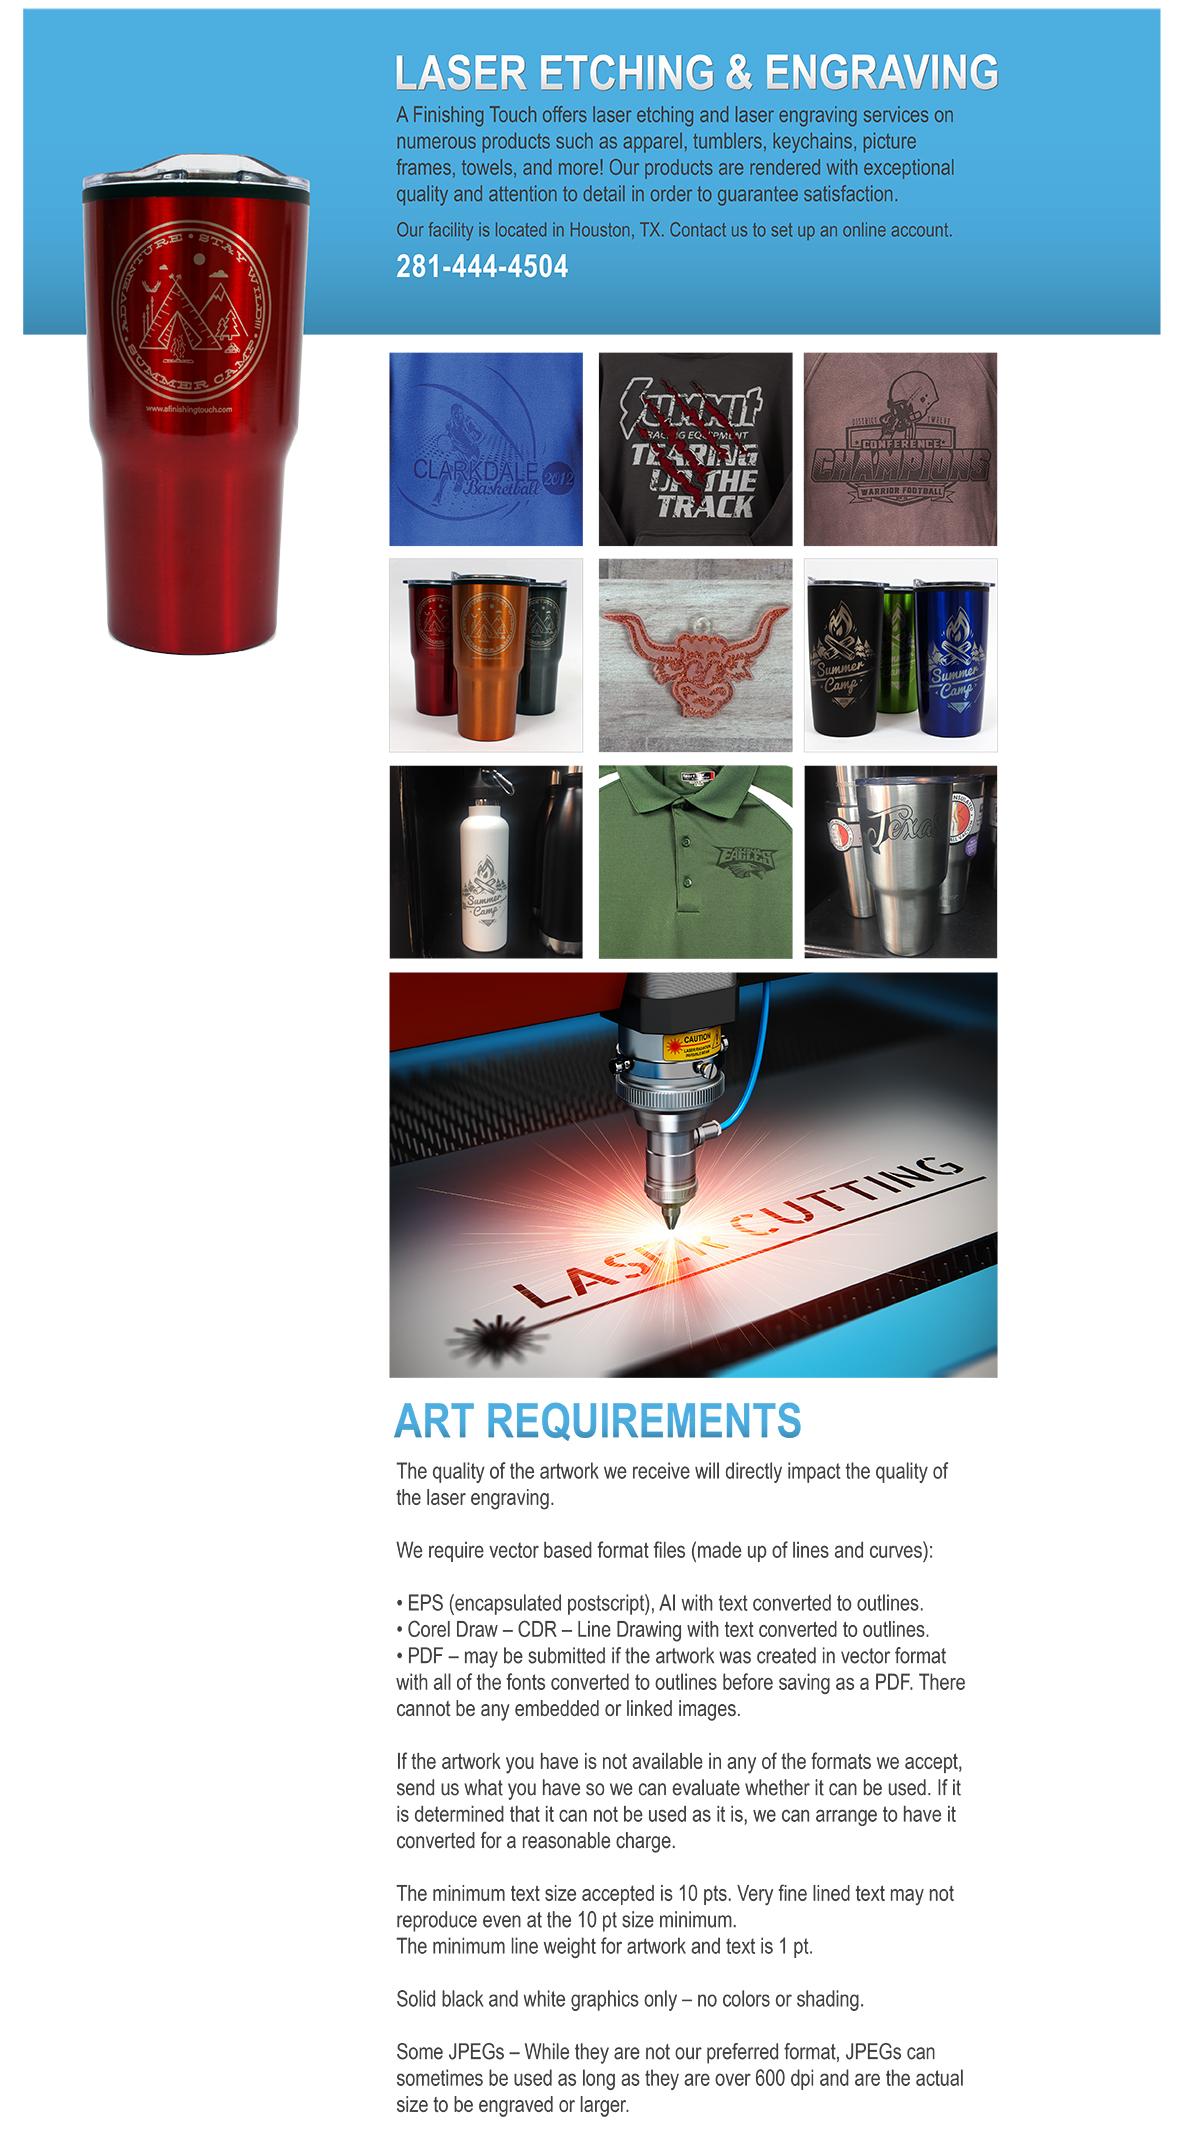 laser-etching-website-page.jpg